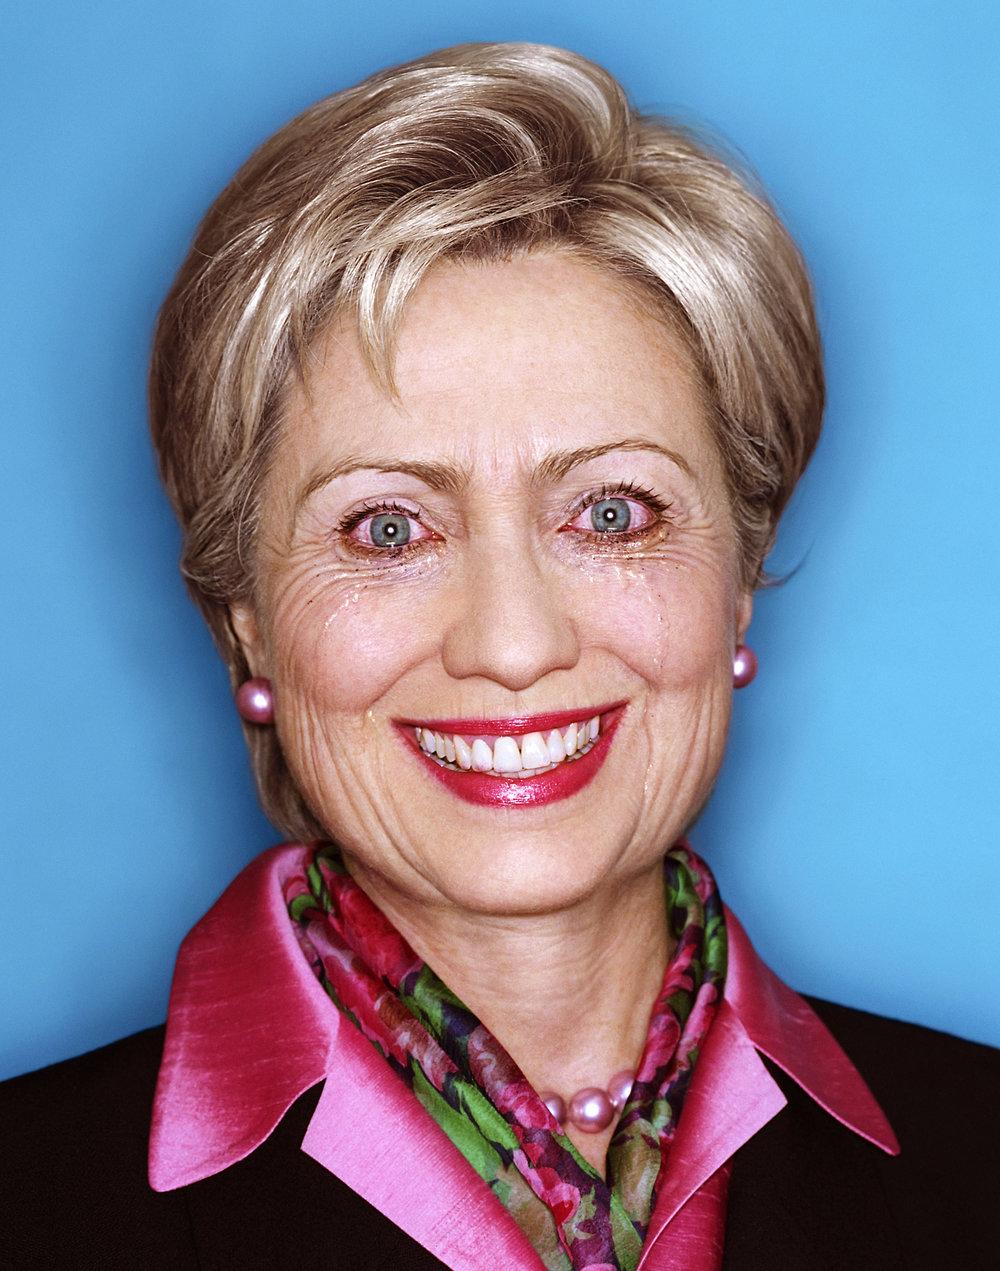 """Hillary Clinton: Politician's Paradox, 2010."" David LaChapelle. © David LaChapelle / Courtesy Staley-Wise Gallery, New York"